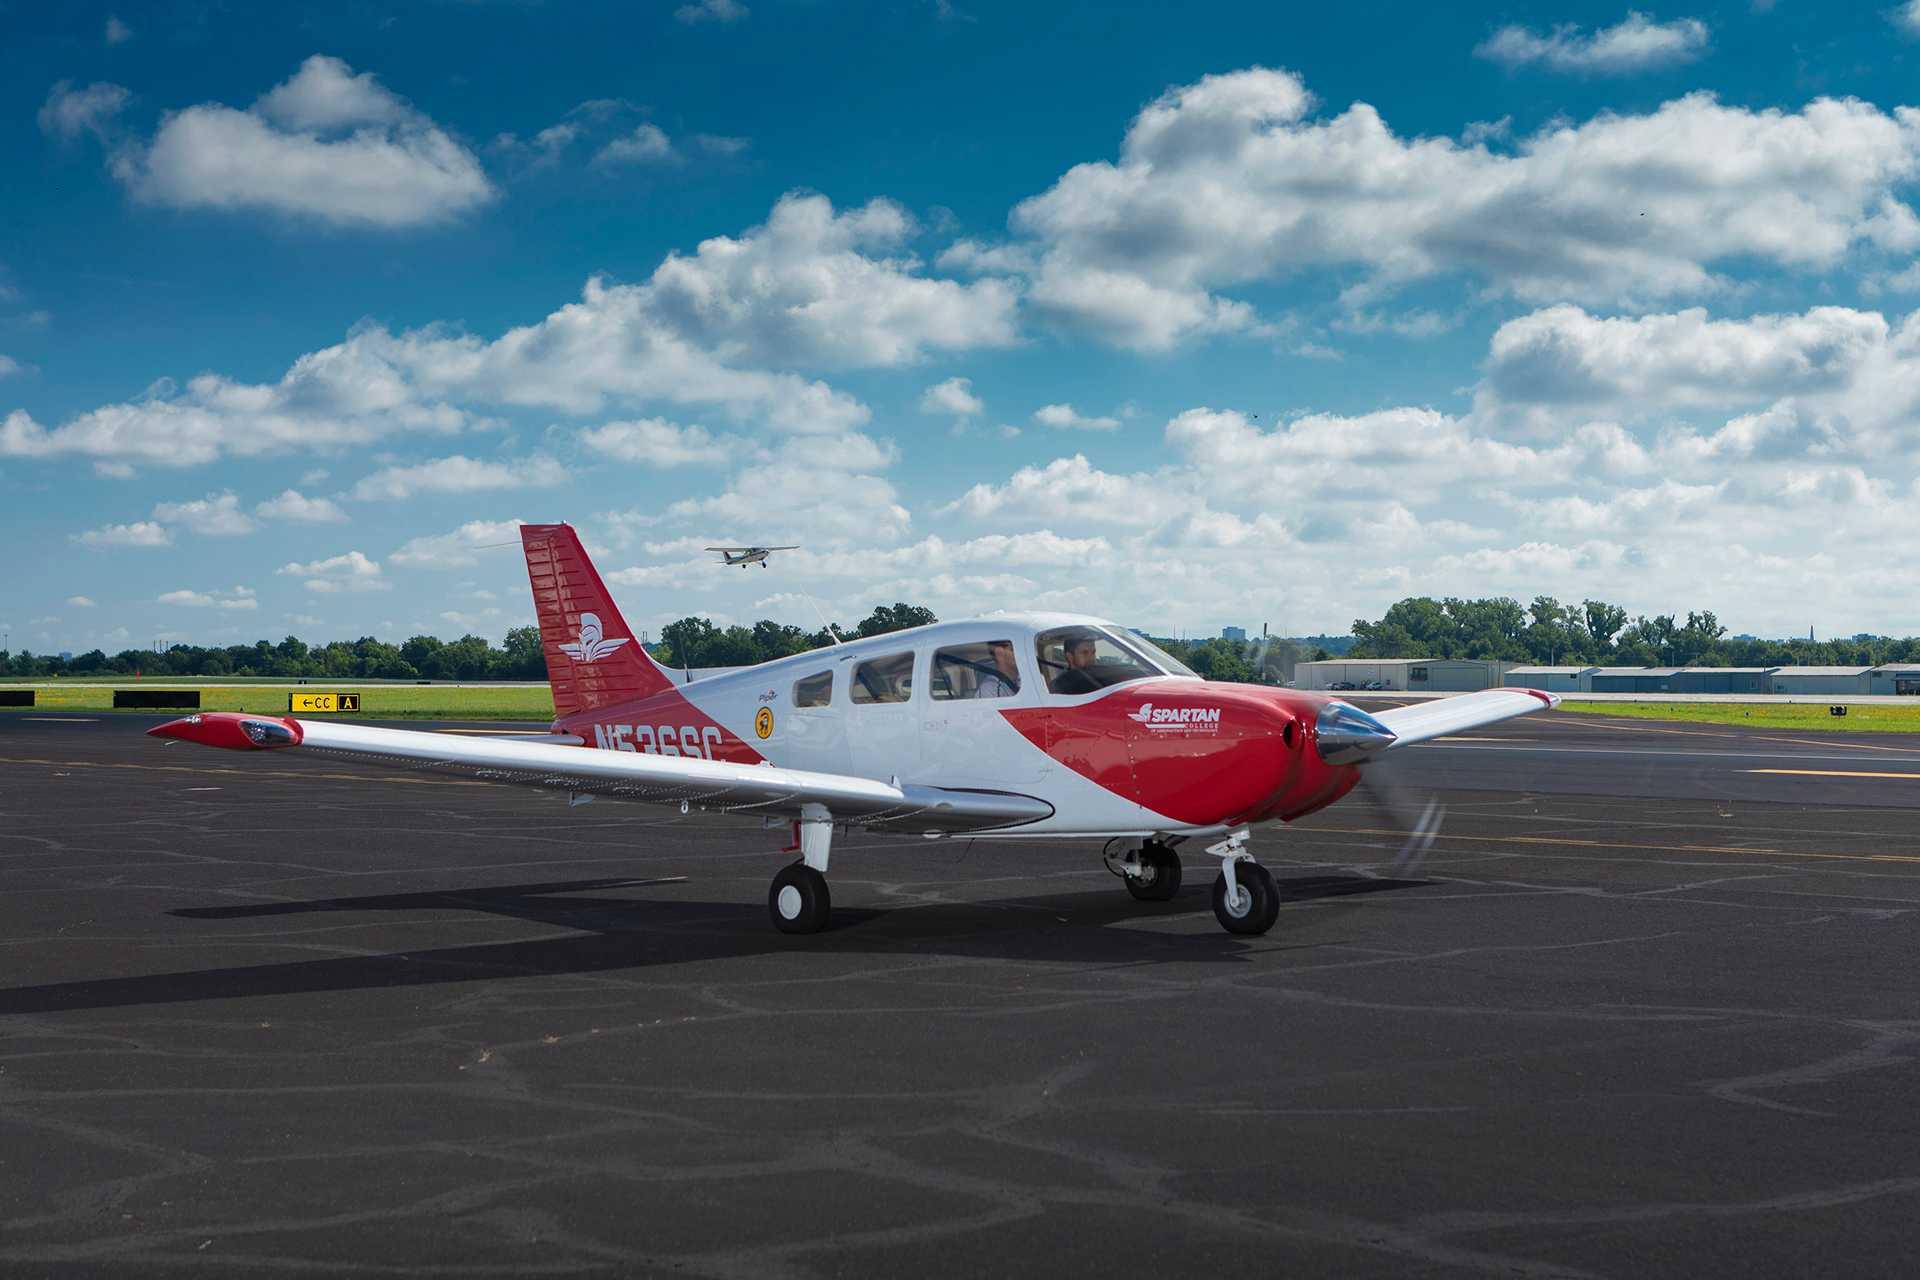 Spartan New Piper Archer Plane on Runway